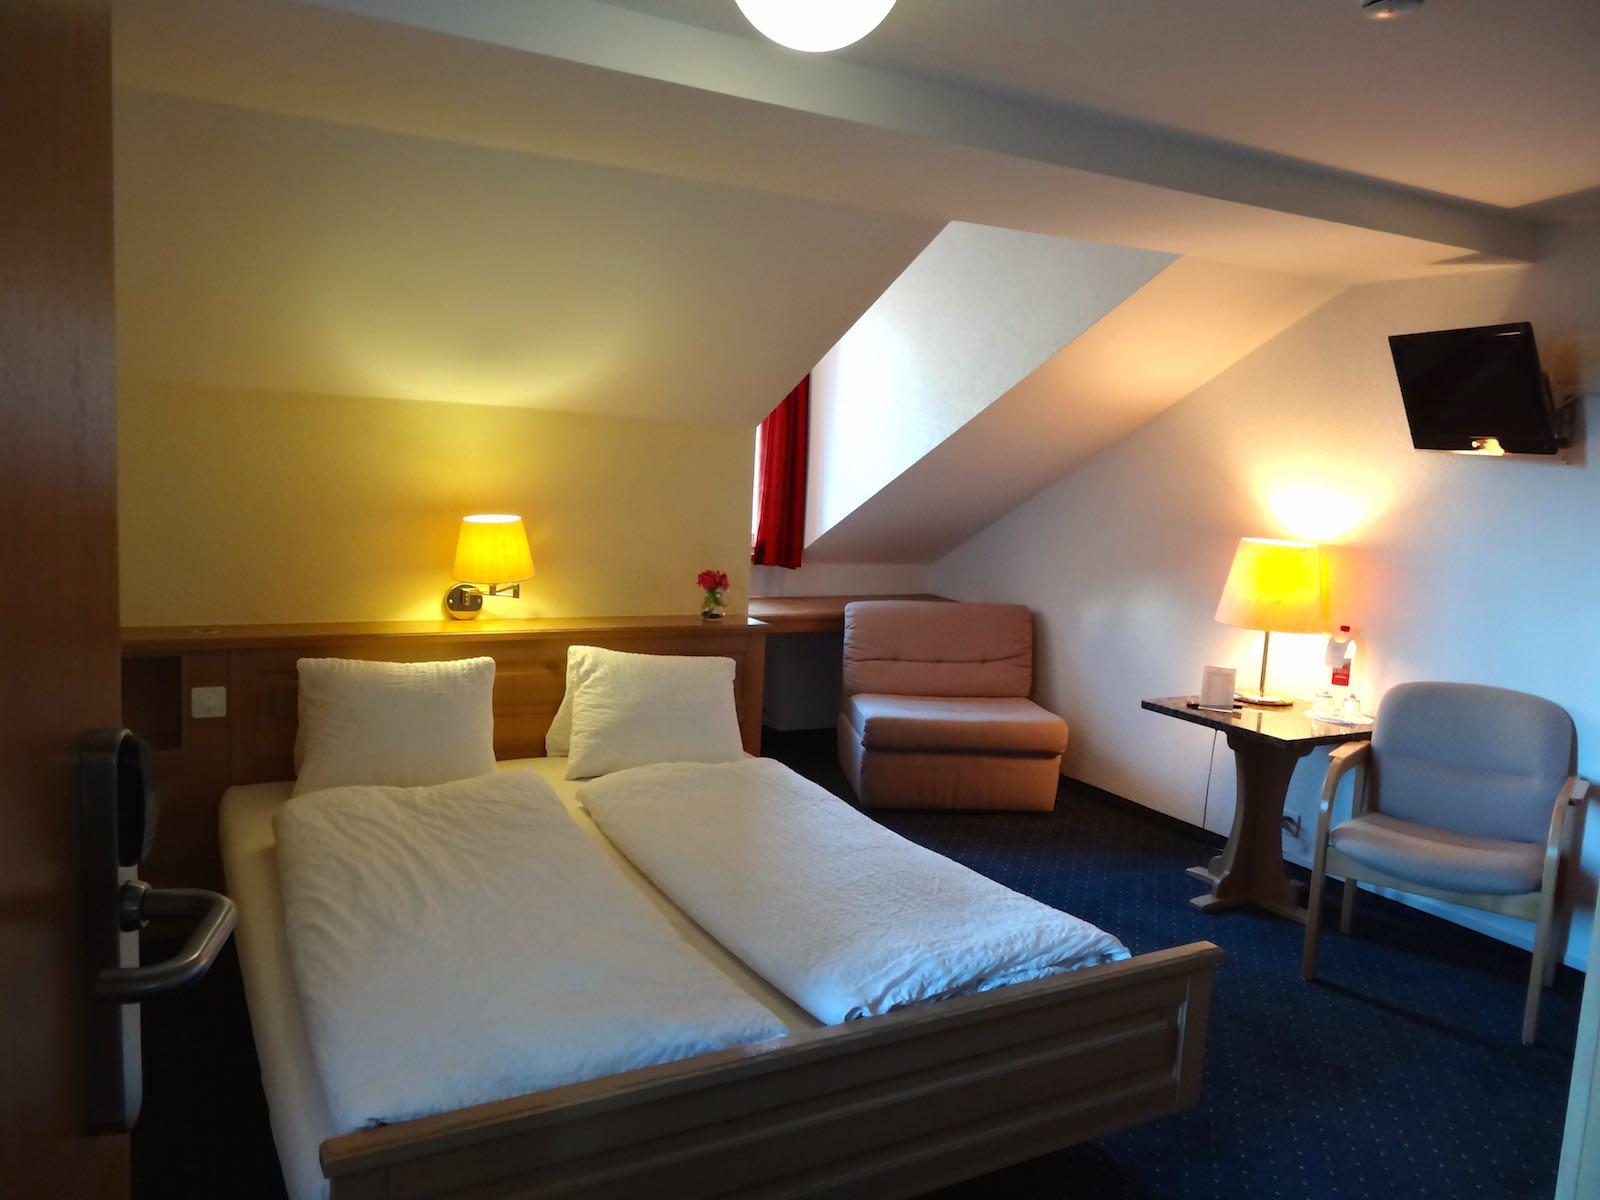 http://hoteljungfrau.ch/wp-content/uploads/2014/09/economy-zimmer-2.jpg